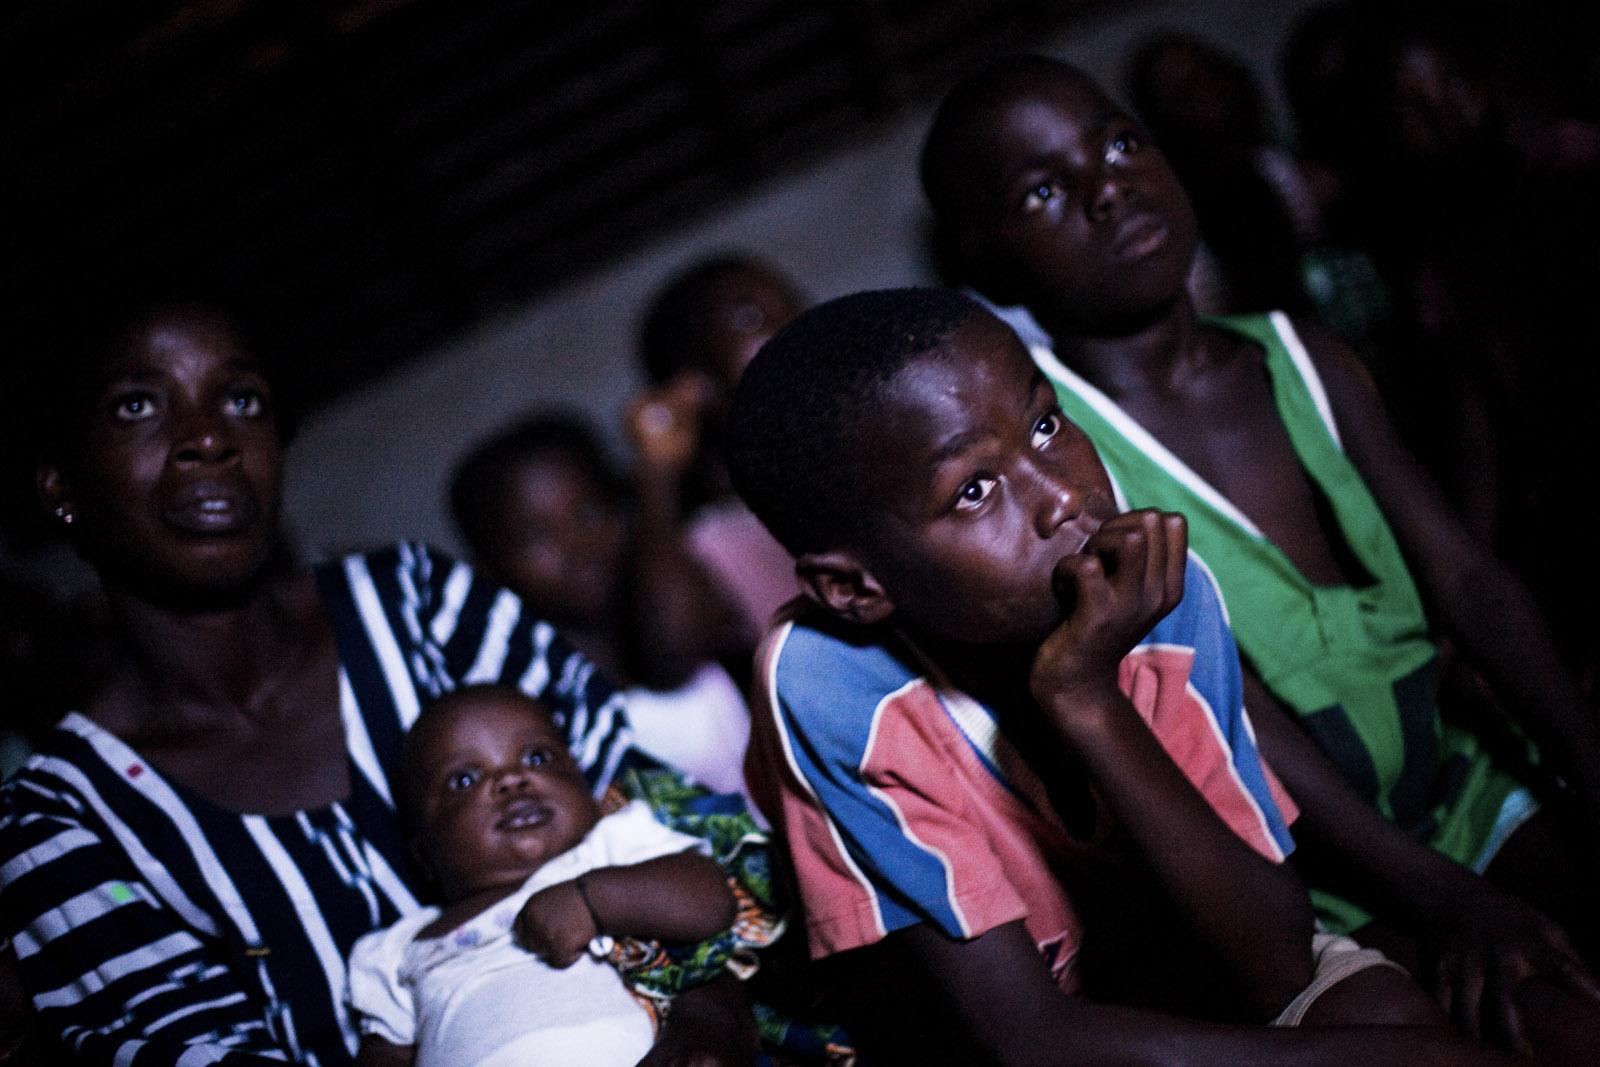 liberia-refugies-ivoiriens-0311-0874hd